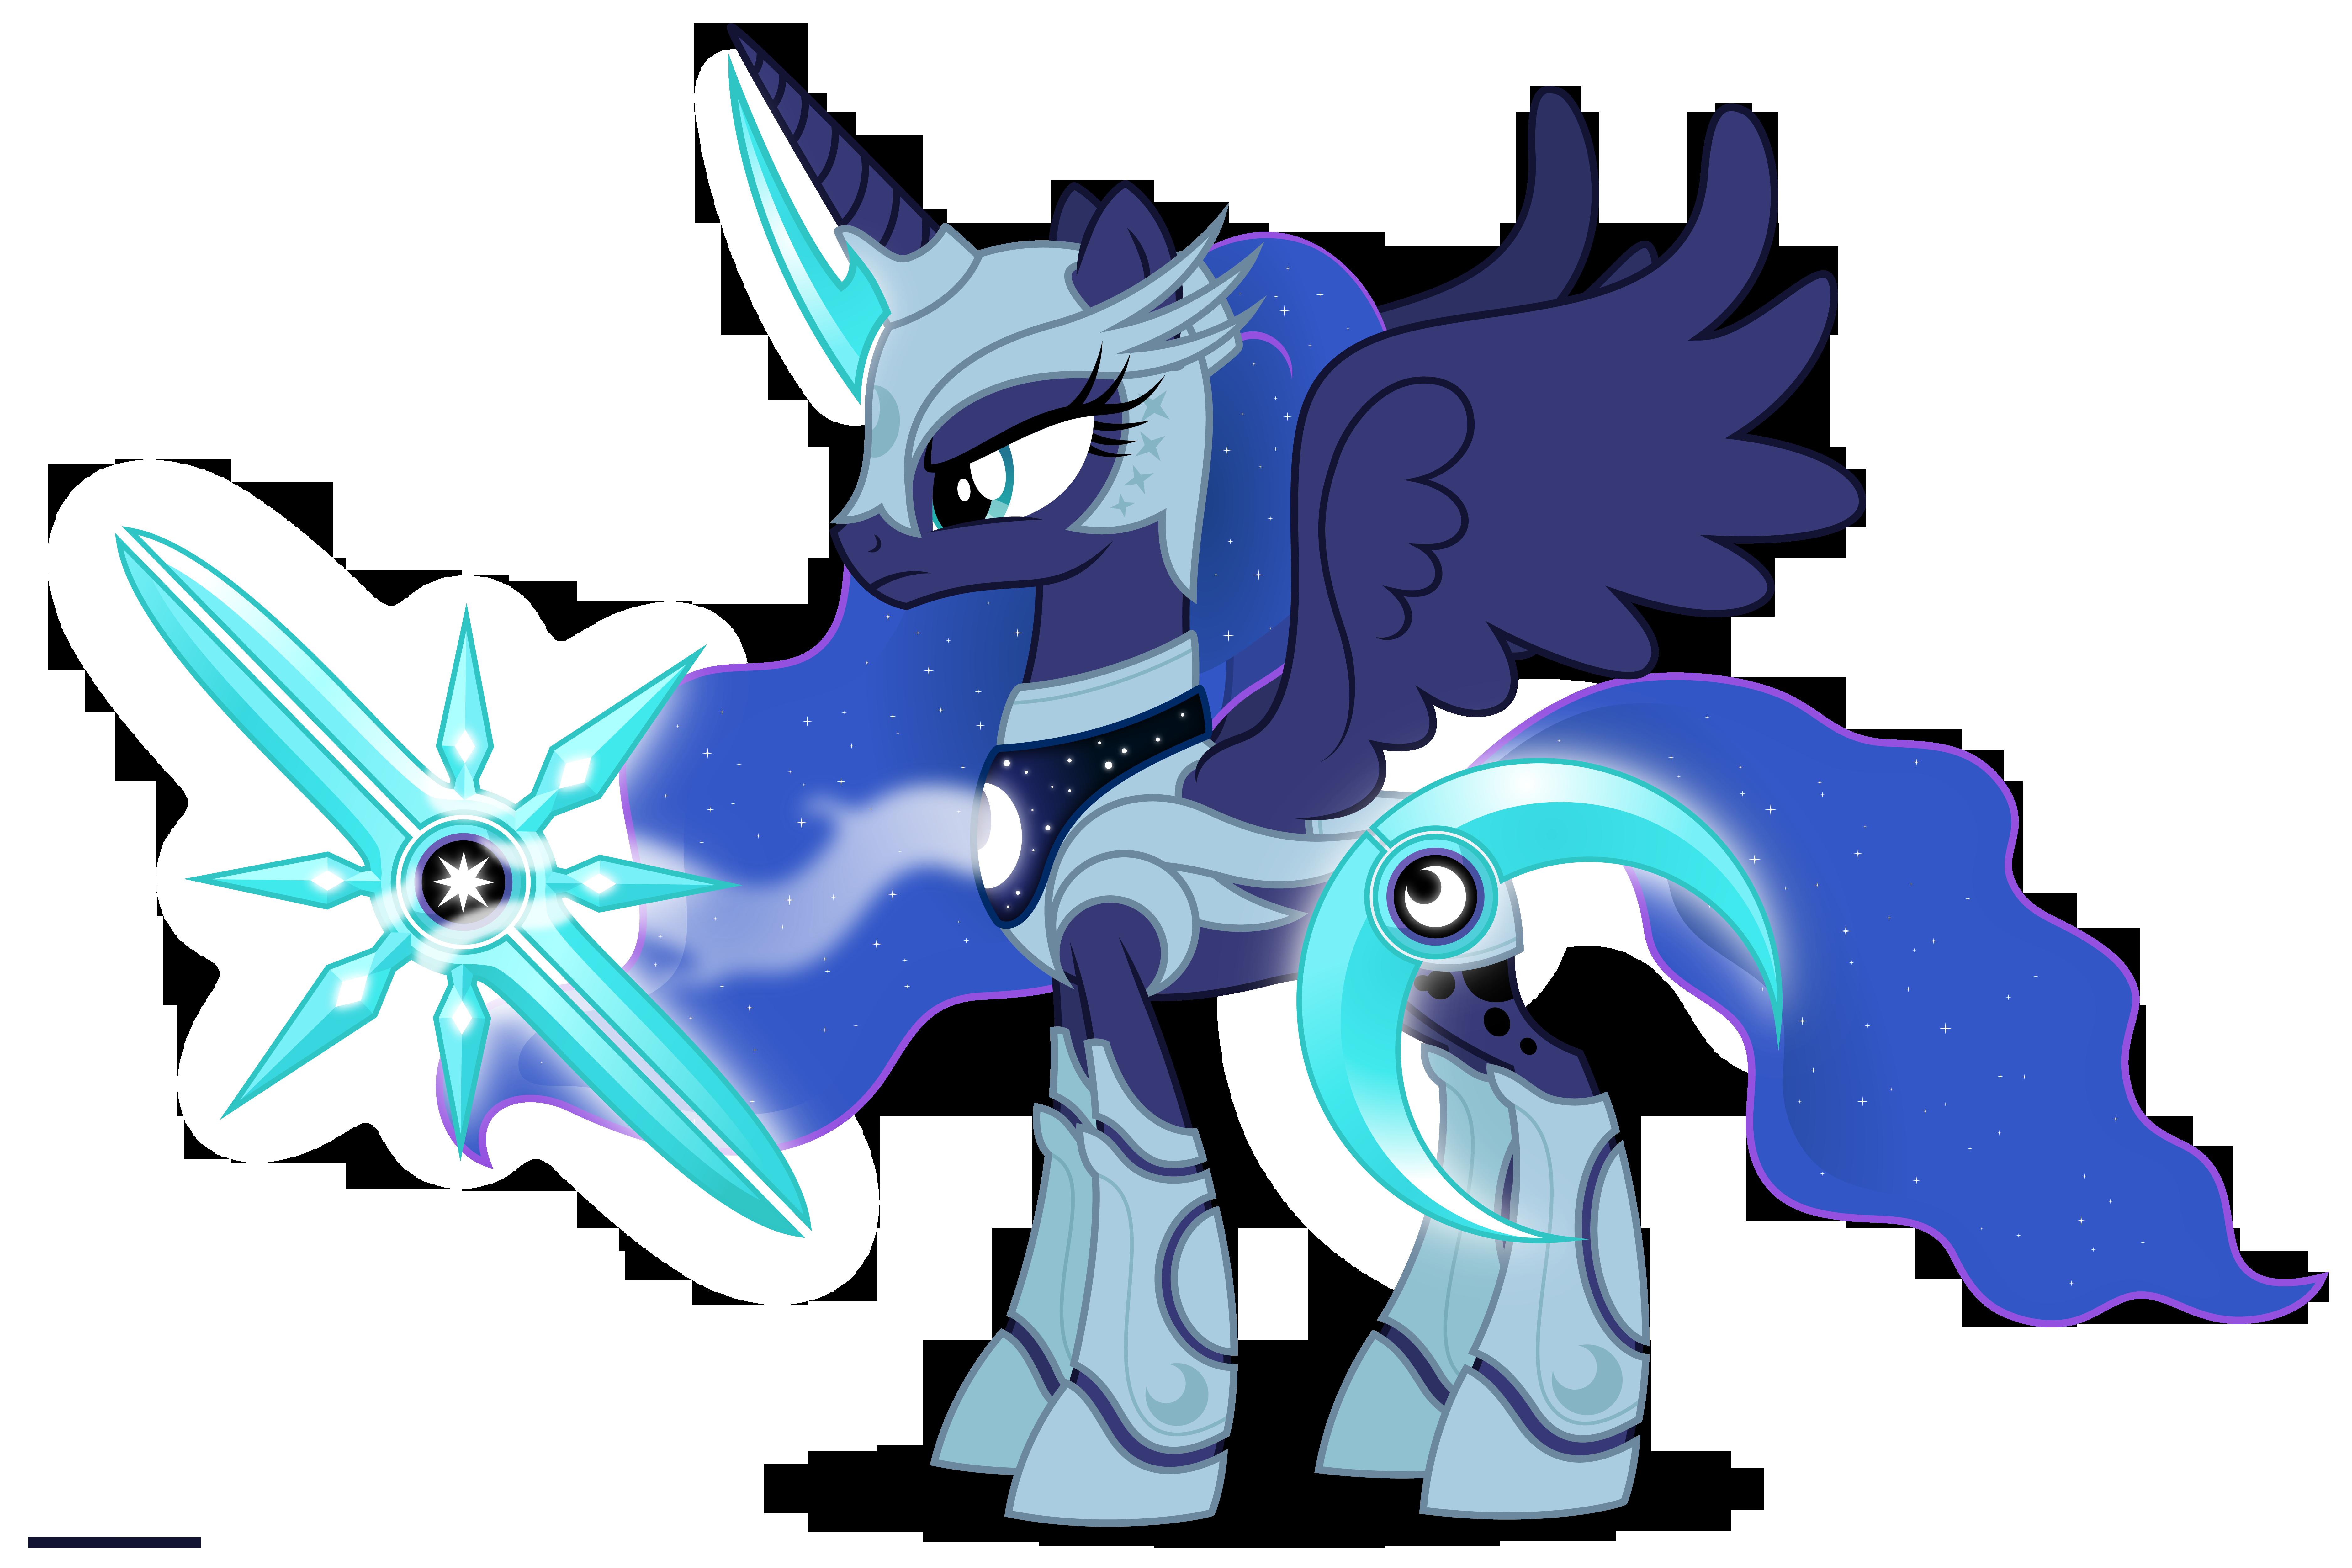 Luna in armor by Larsurus